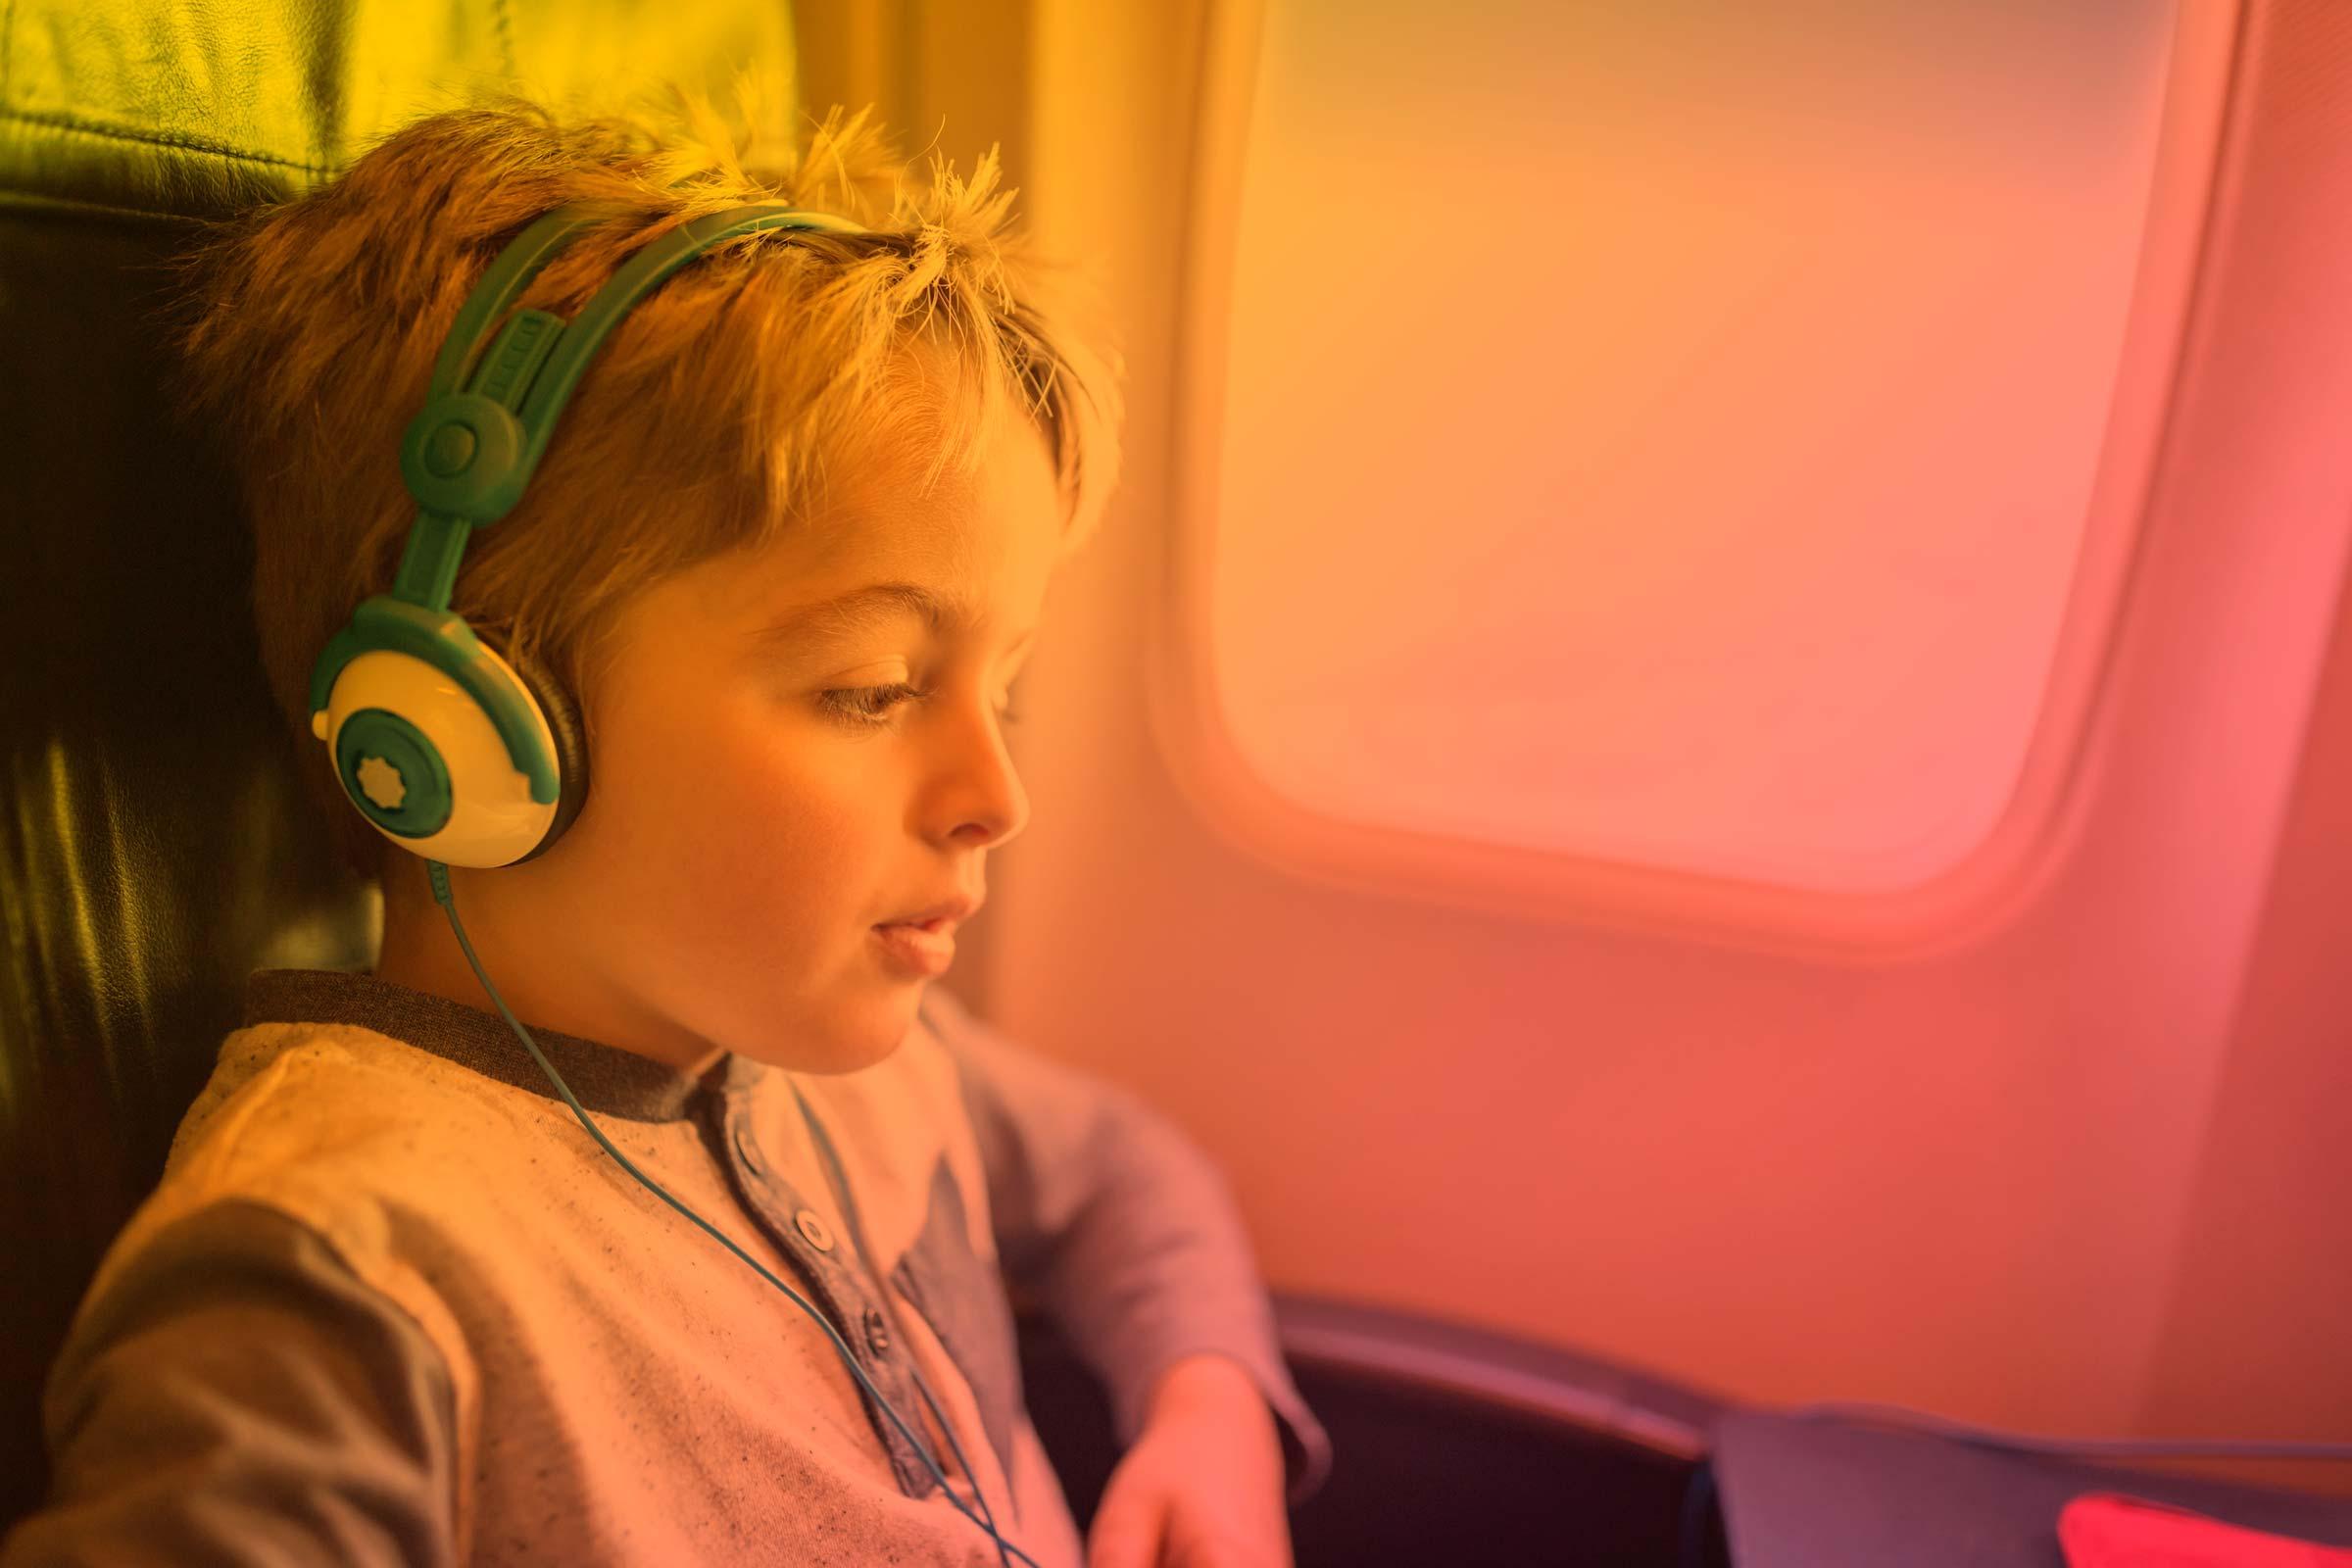 entertainment for kids in flight